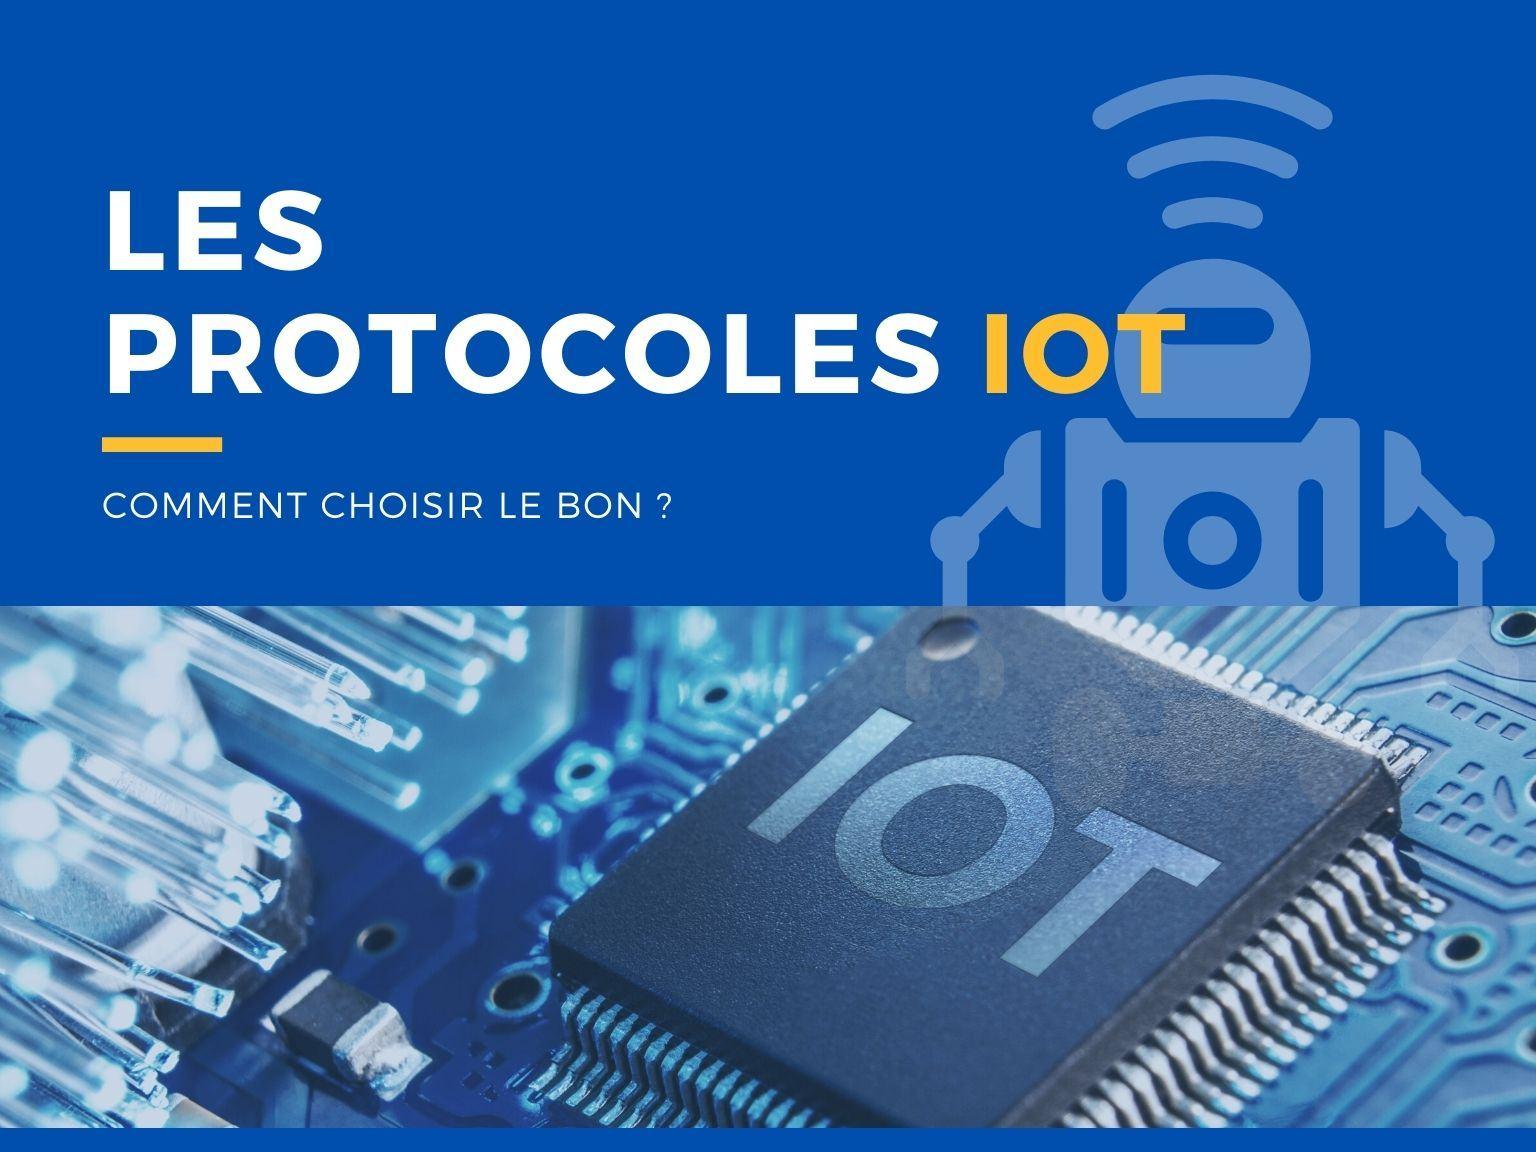 Les protocoles IoT